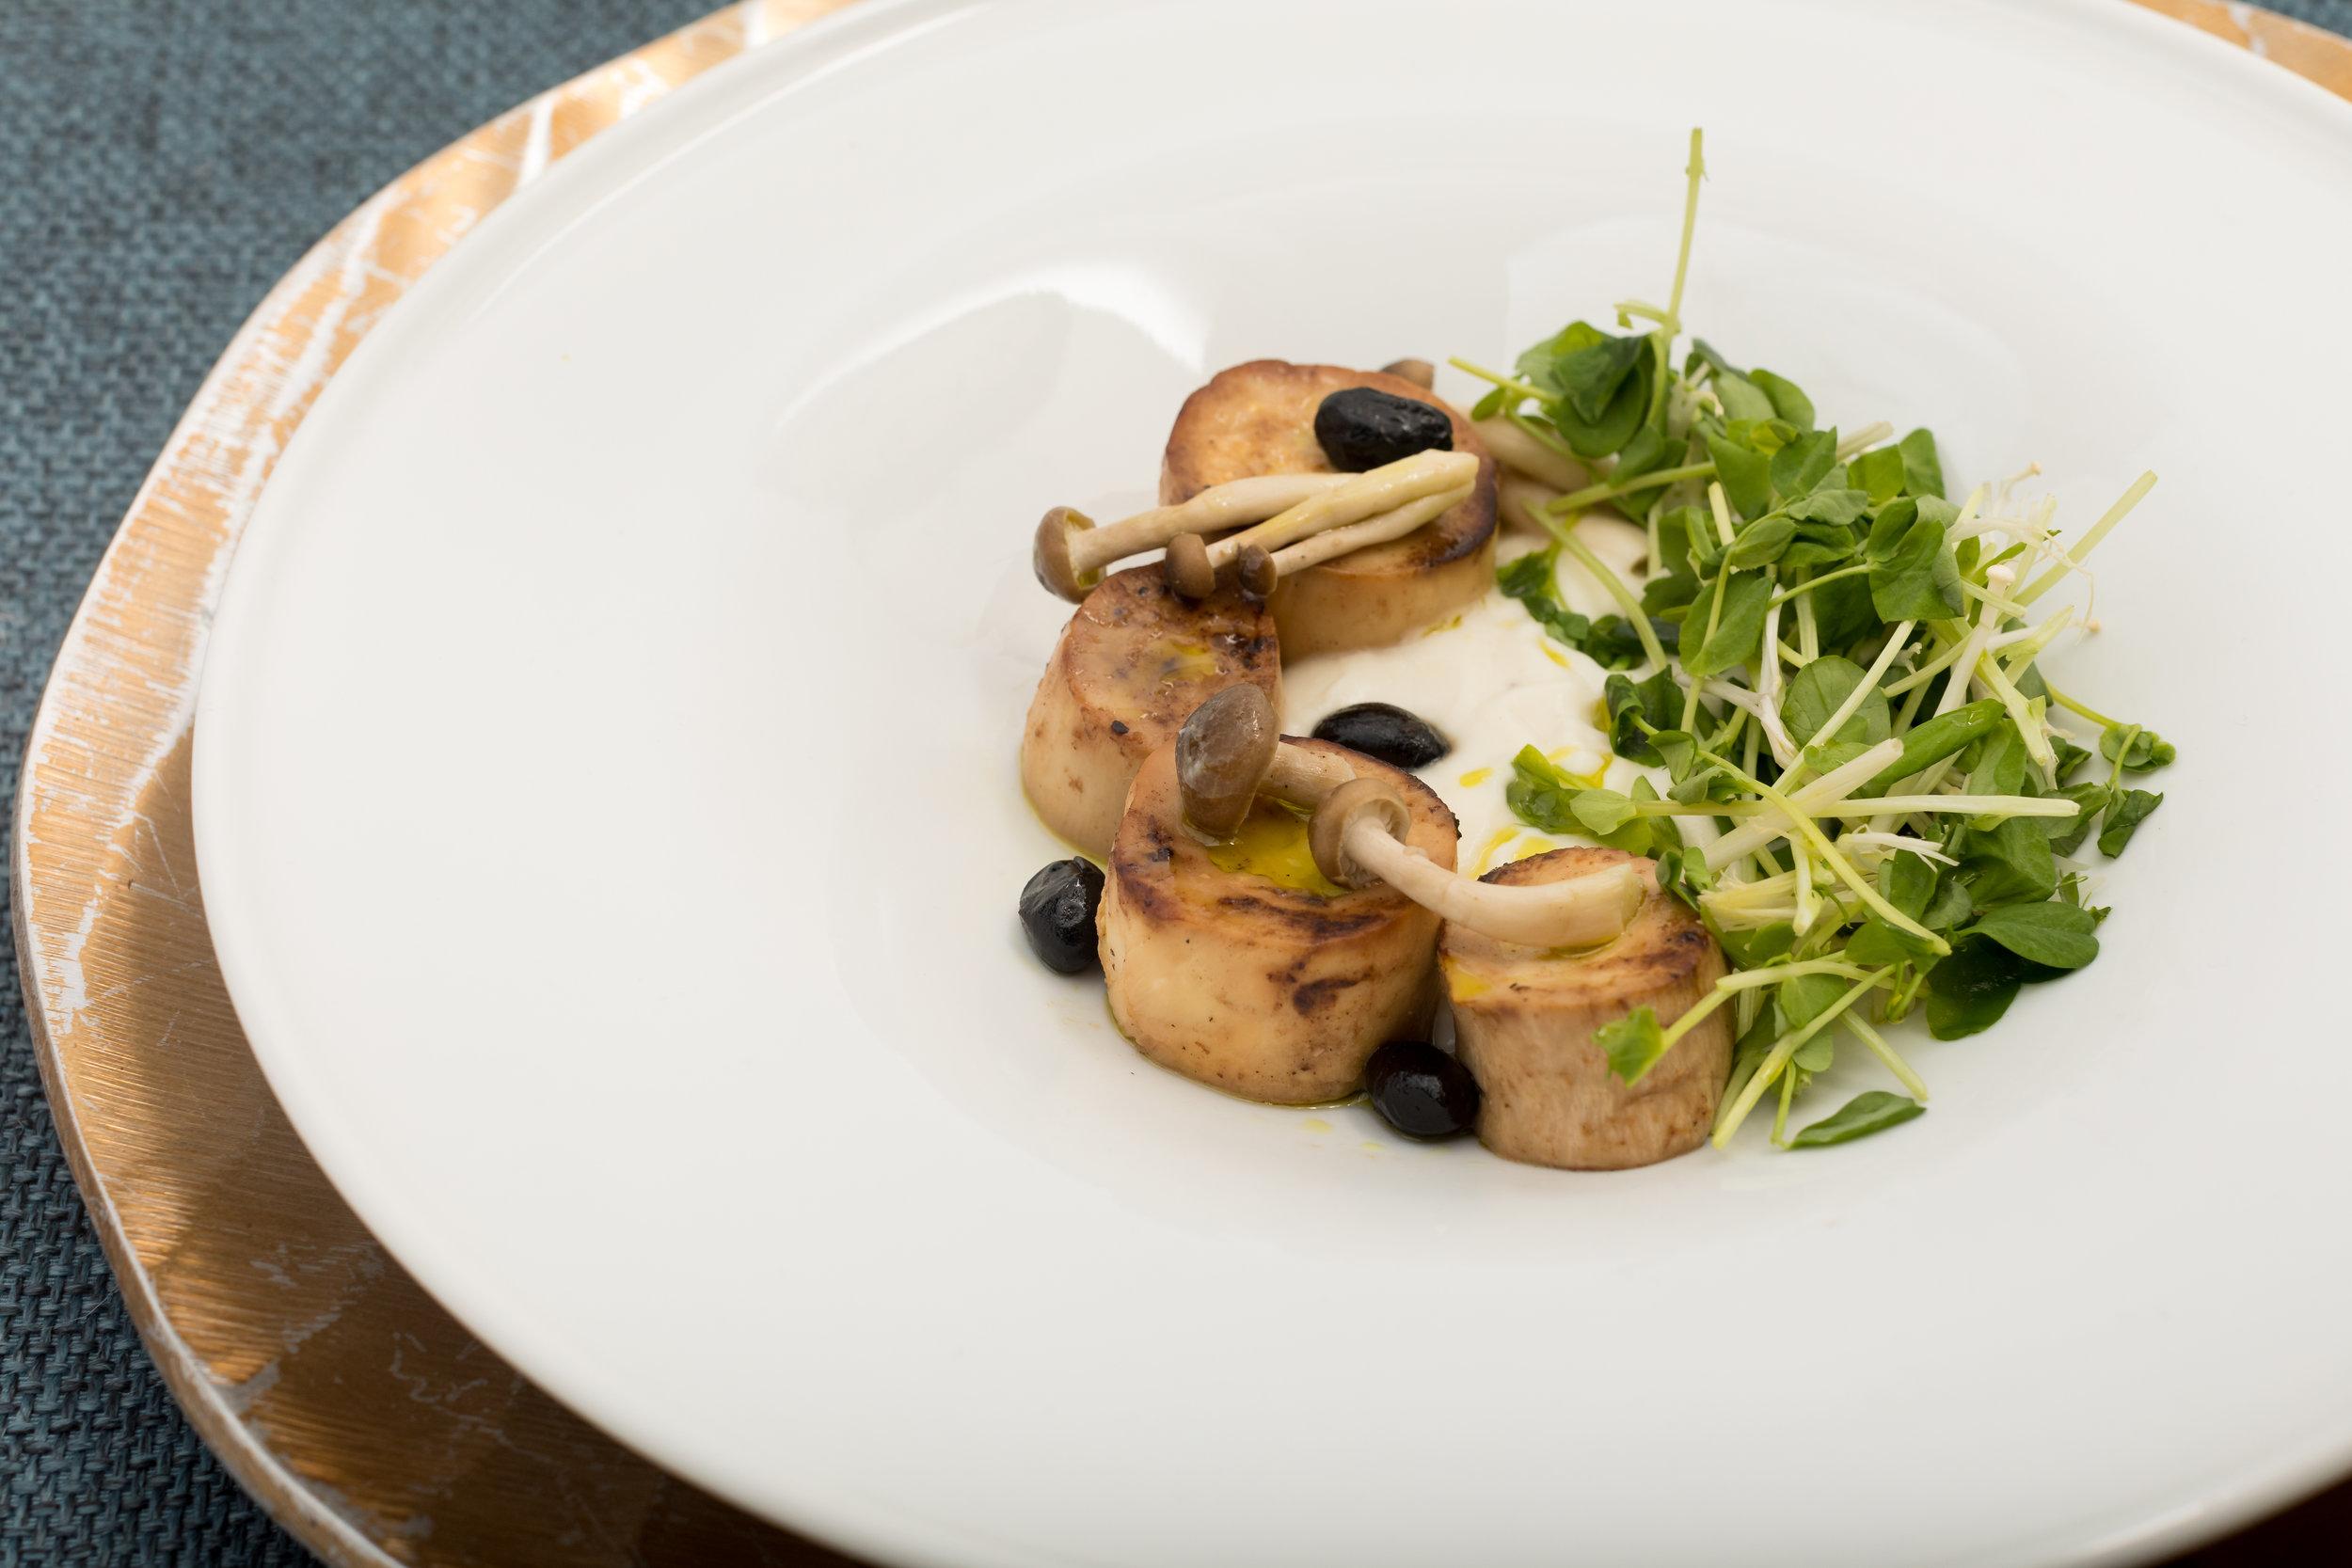 Miso Glaced King Oyster Mushroom Scallops w_Cauliflower, Lemon Veloute & Snow Peas,Pea Tendrils_Amanda Gentile3.jpg